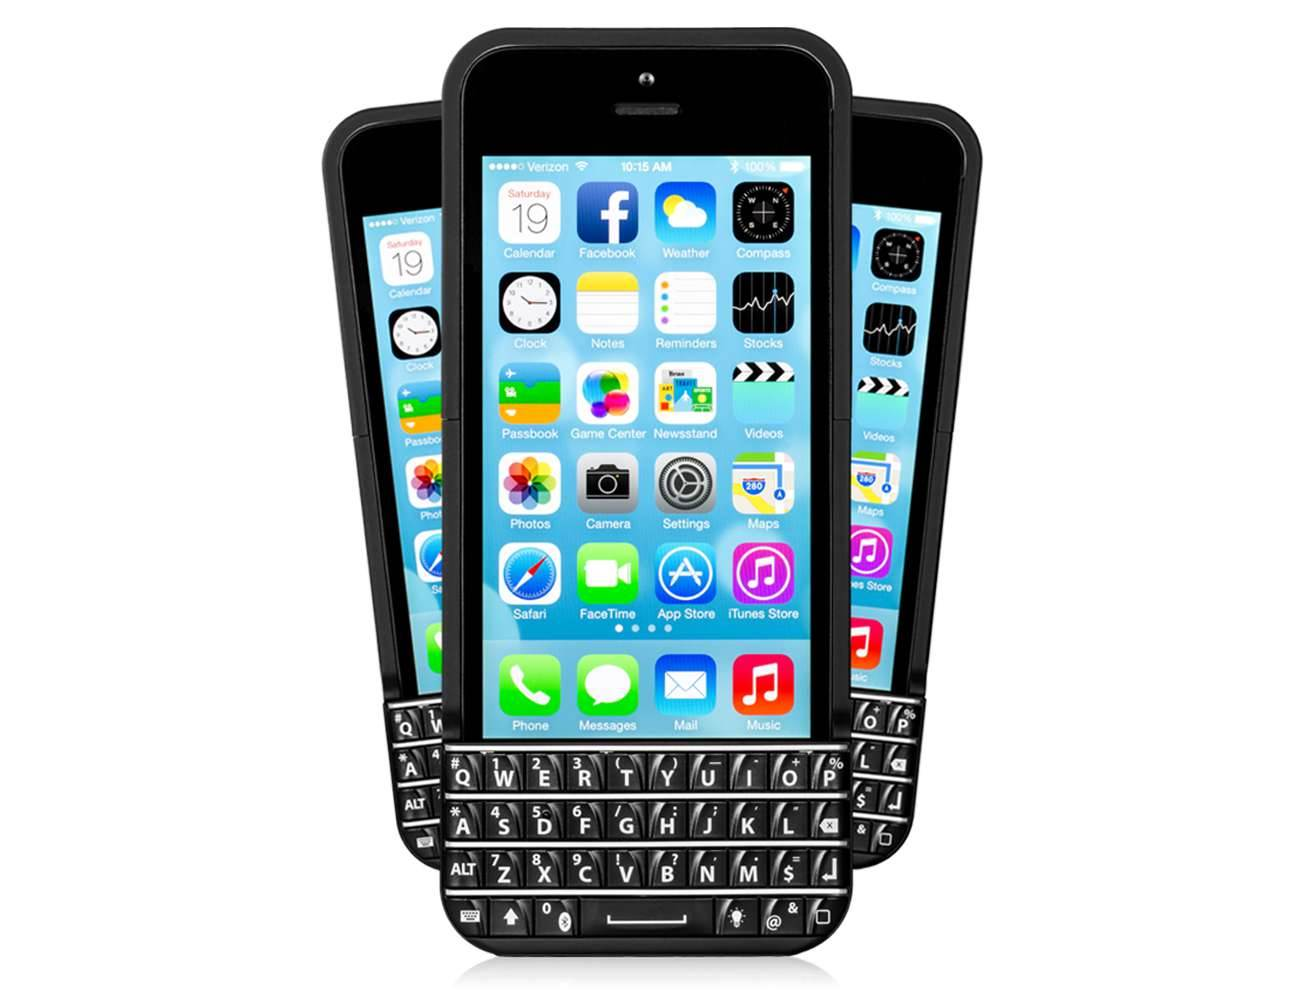 Klawiatura BlackBerry w iPhone nowosci, akcesoria Typo, klawiatura BlackBerry, klawiatura, iPhone5s, iPhone5c, iPhone5, Apple, Akcesoria   Klaw